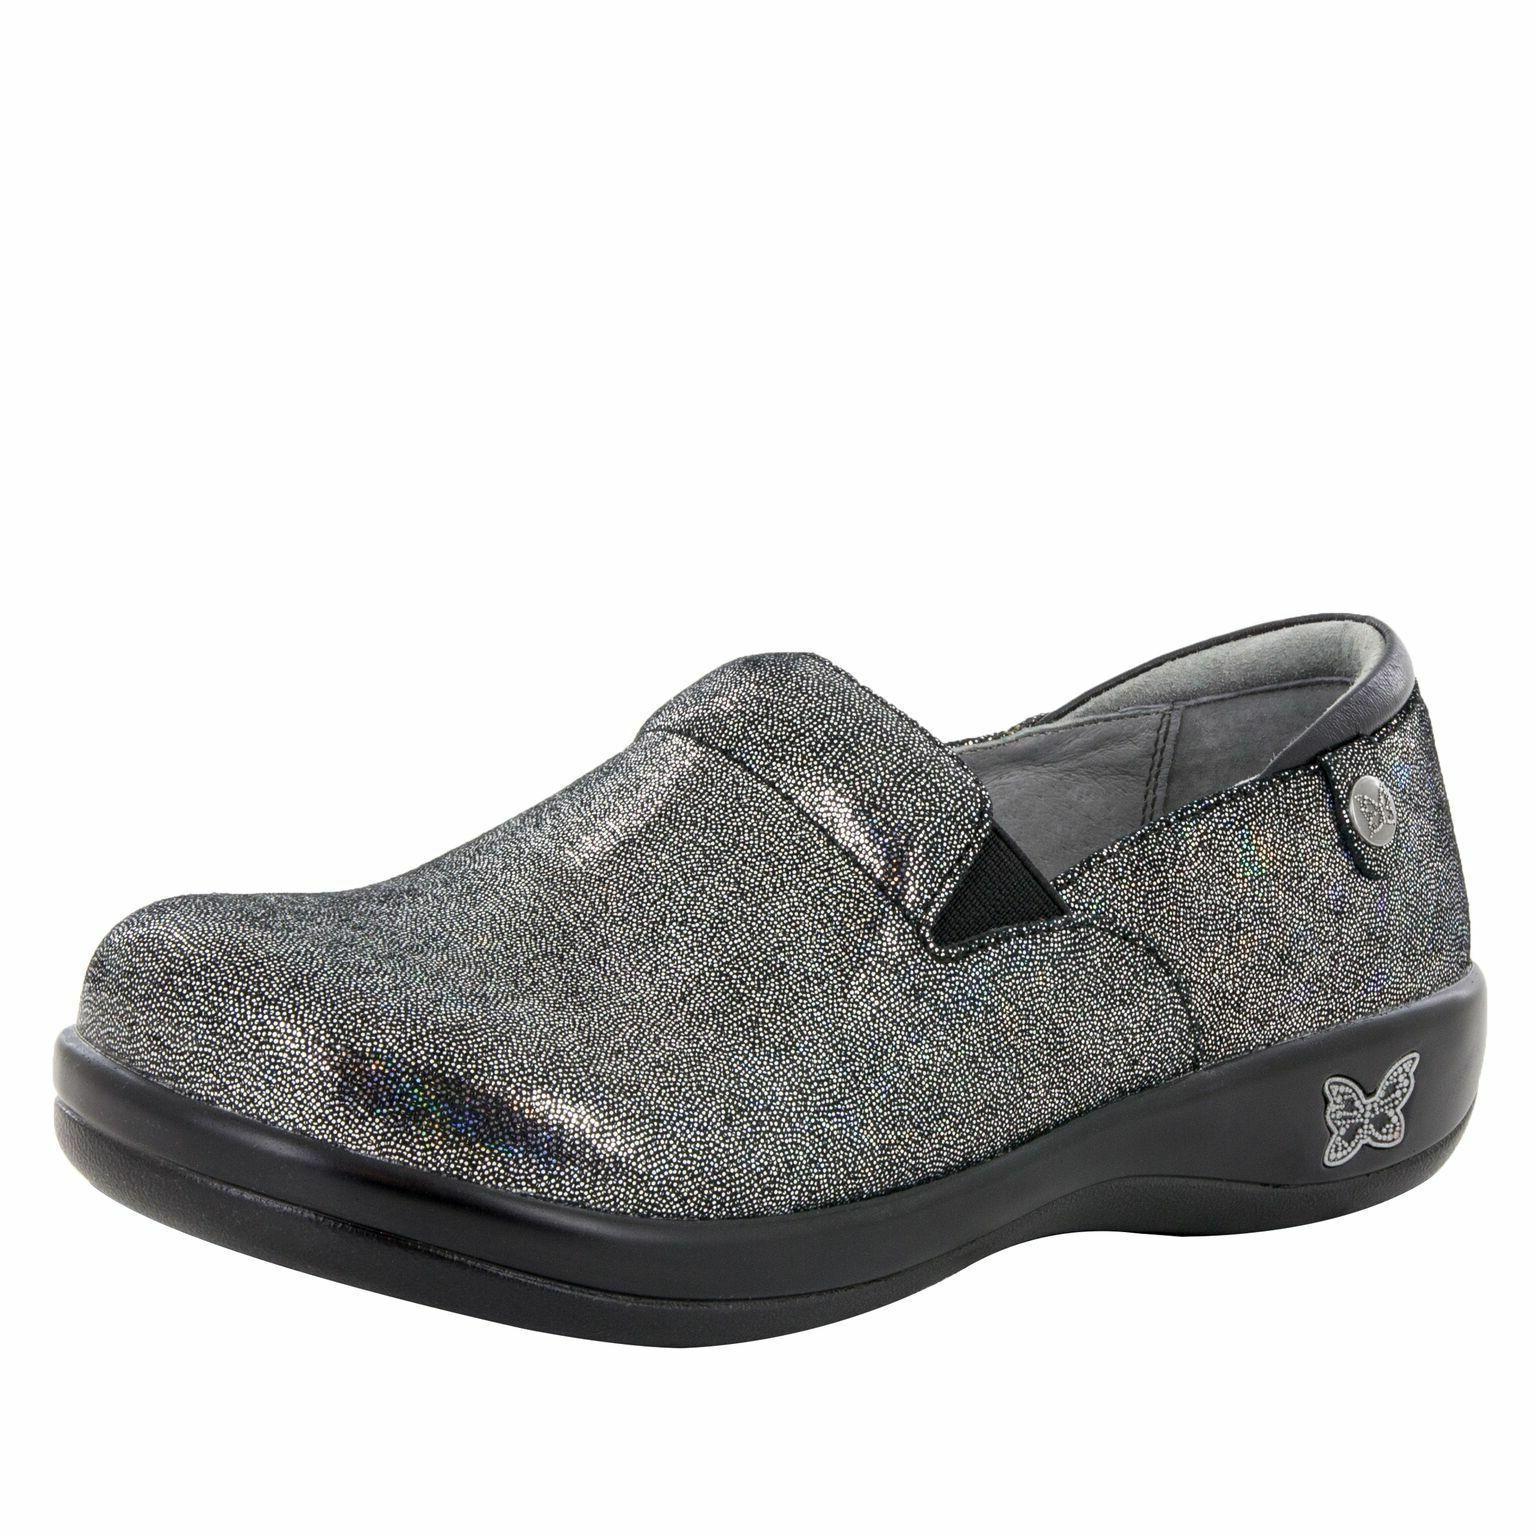 Alegria Keli Style KEL 674